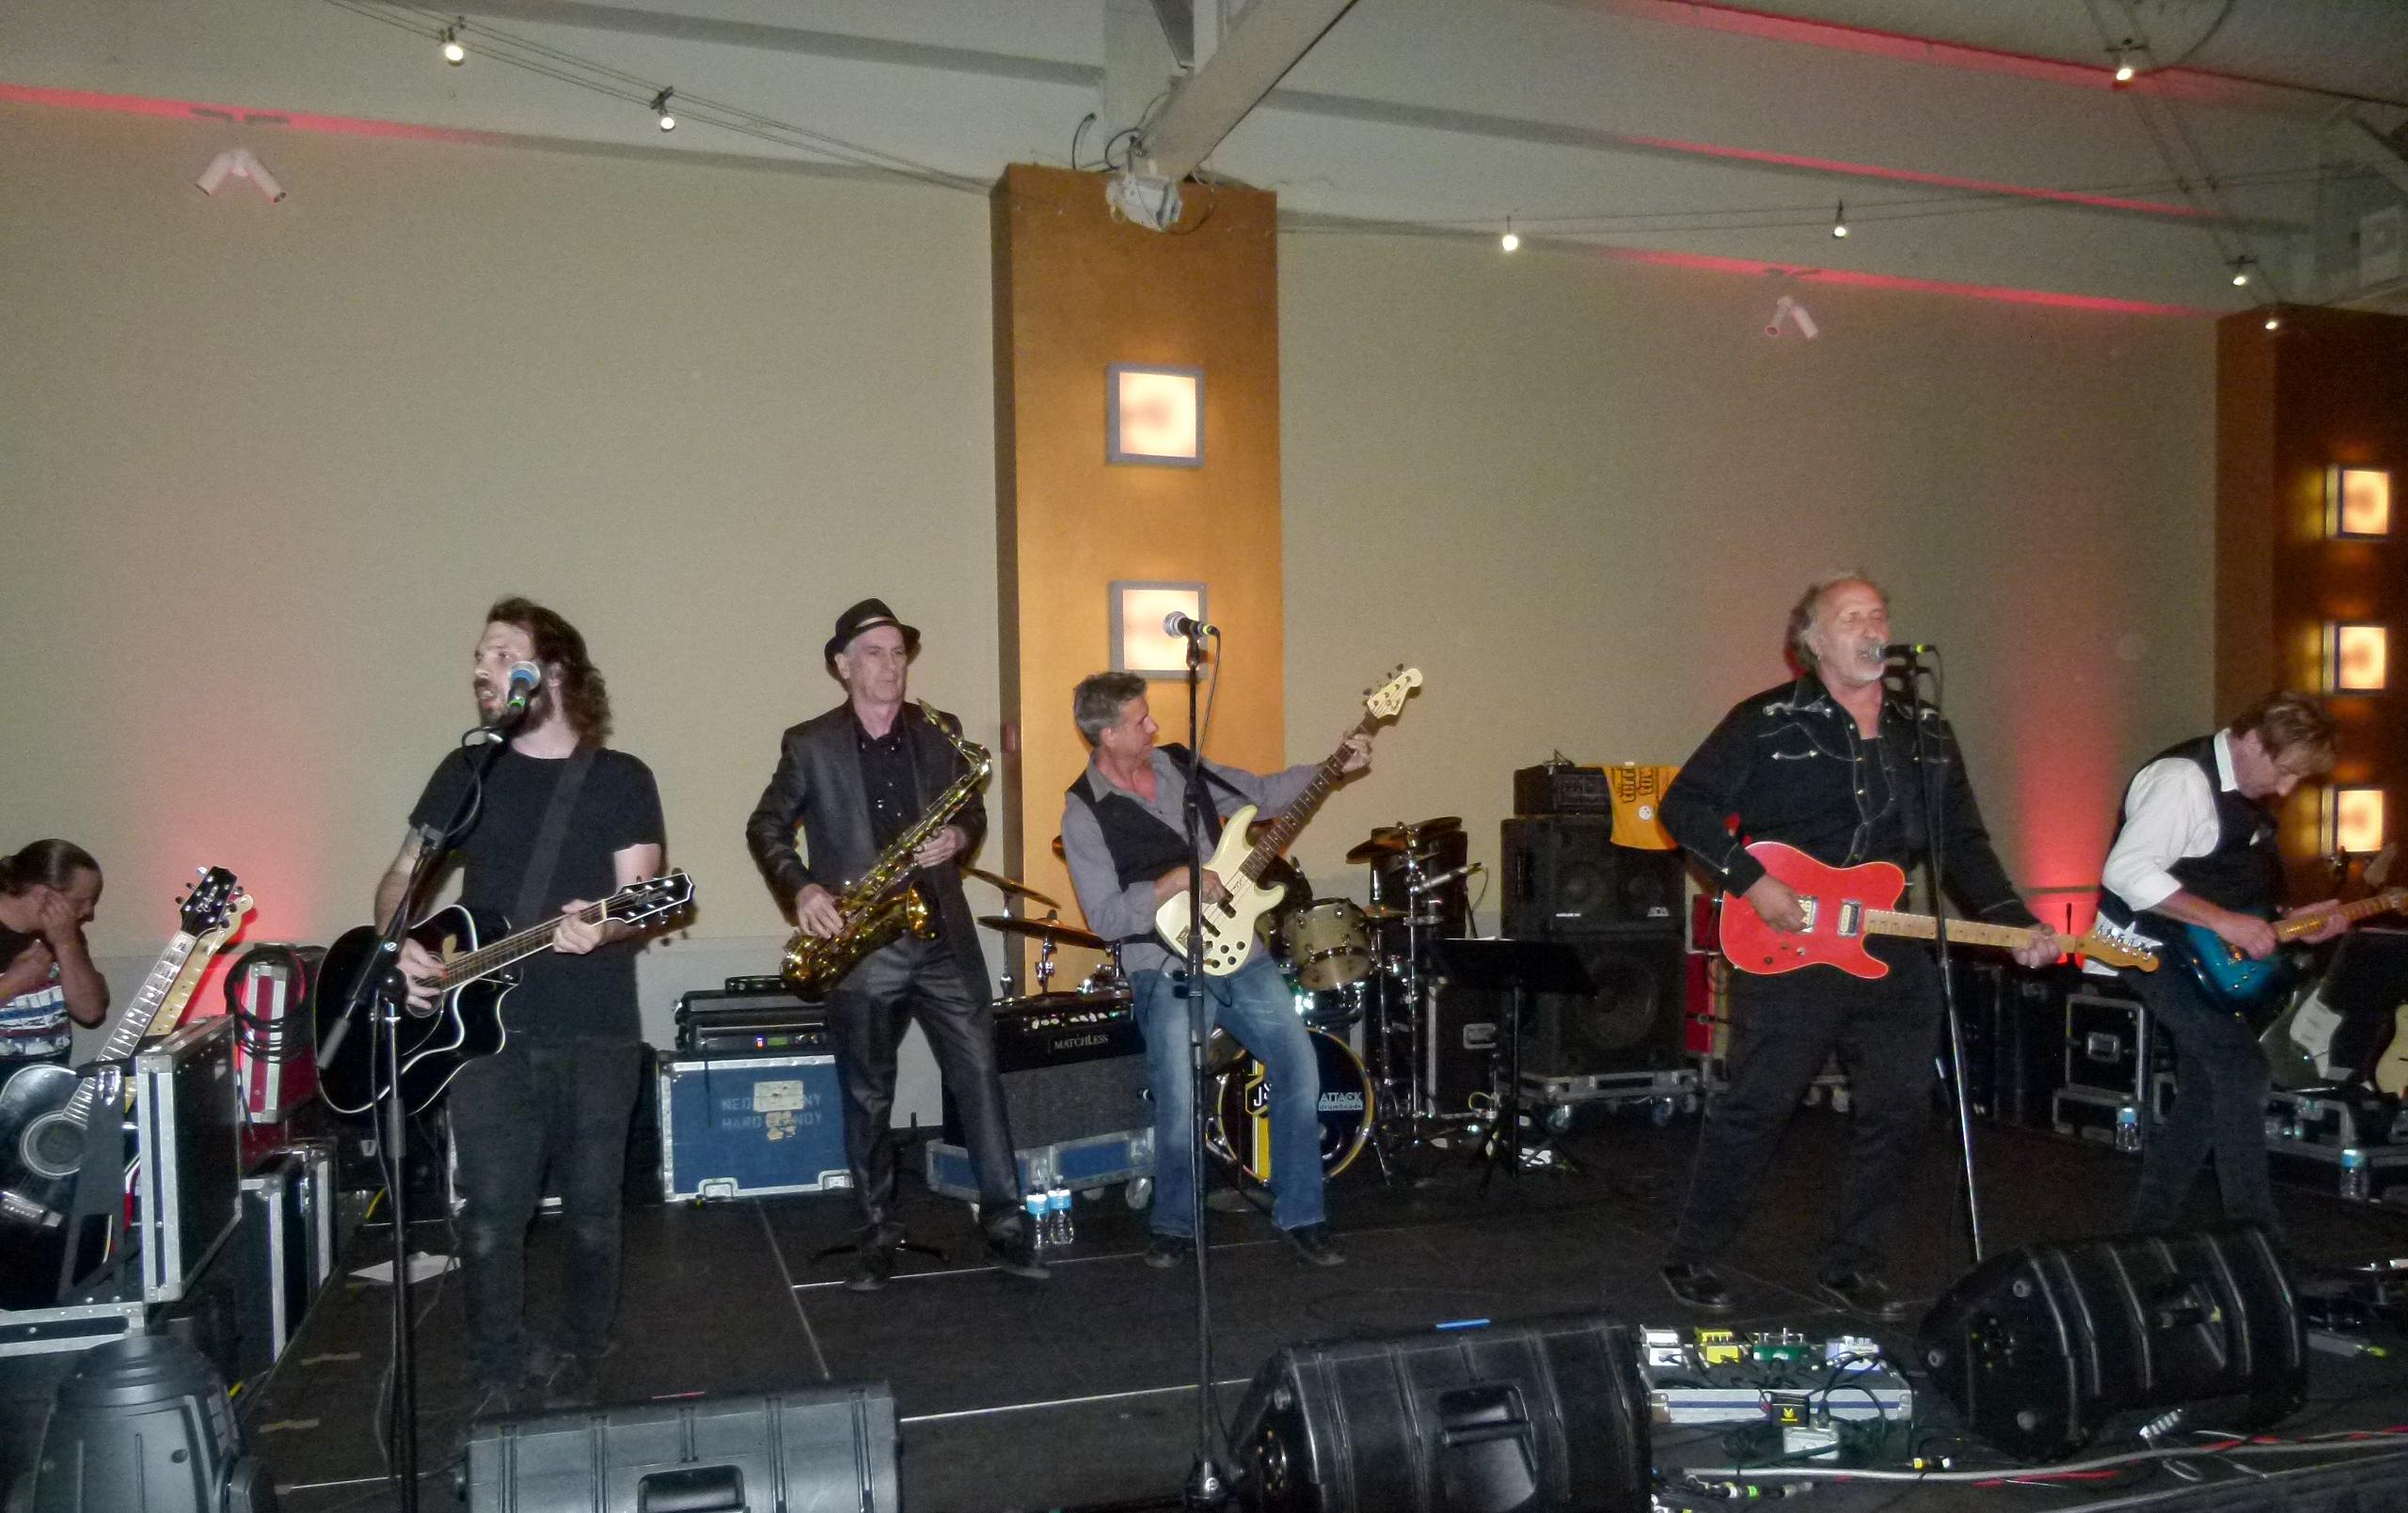 Joe Grushecky and The Houserockers bring the Bash to a rockin' climax.